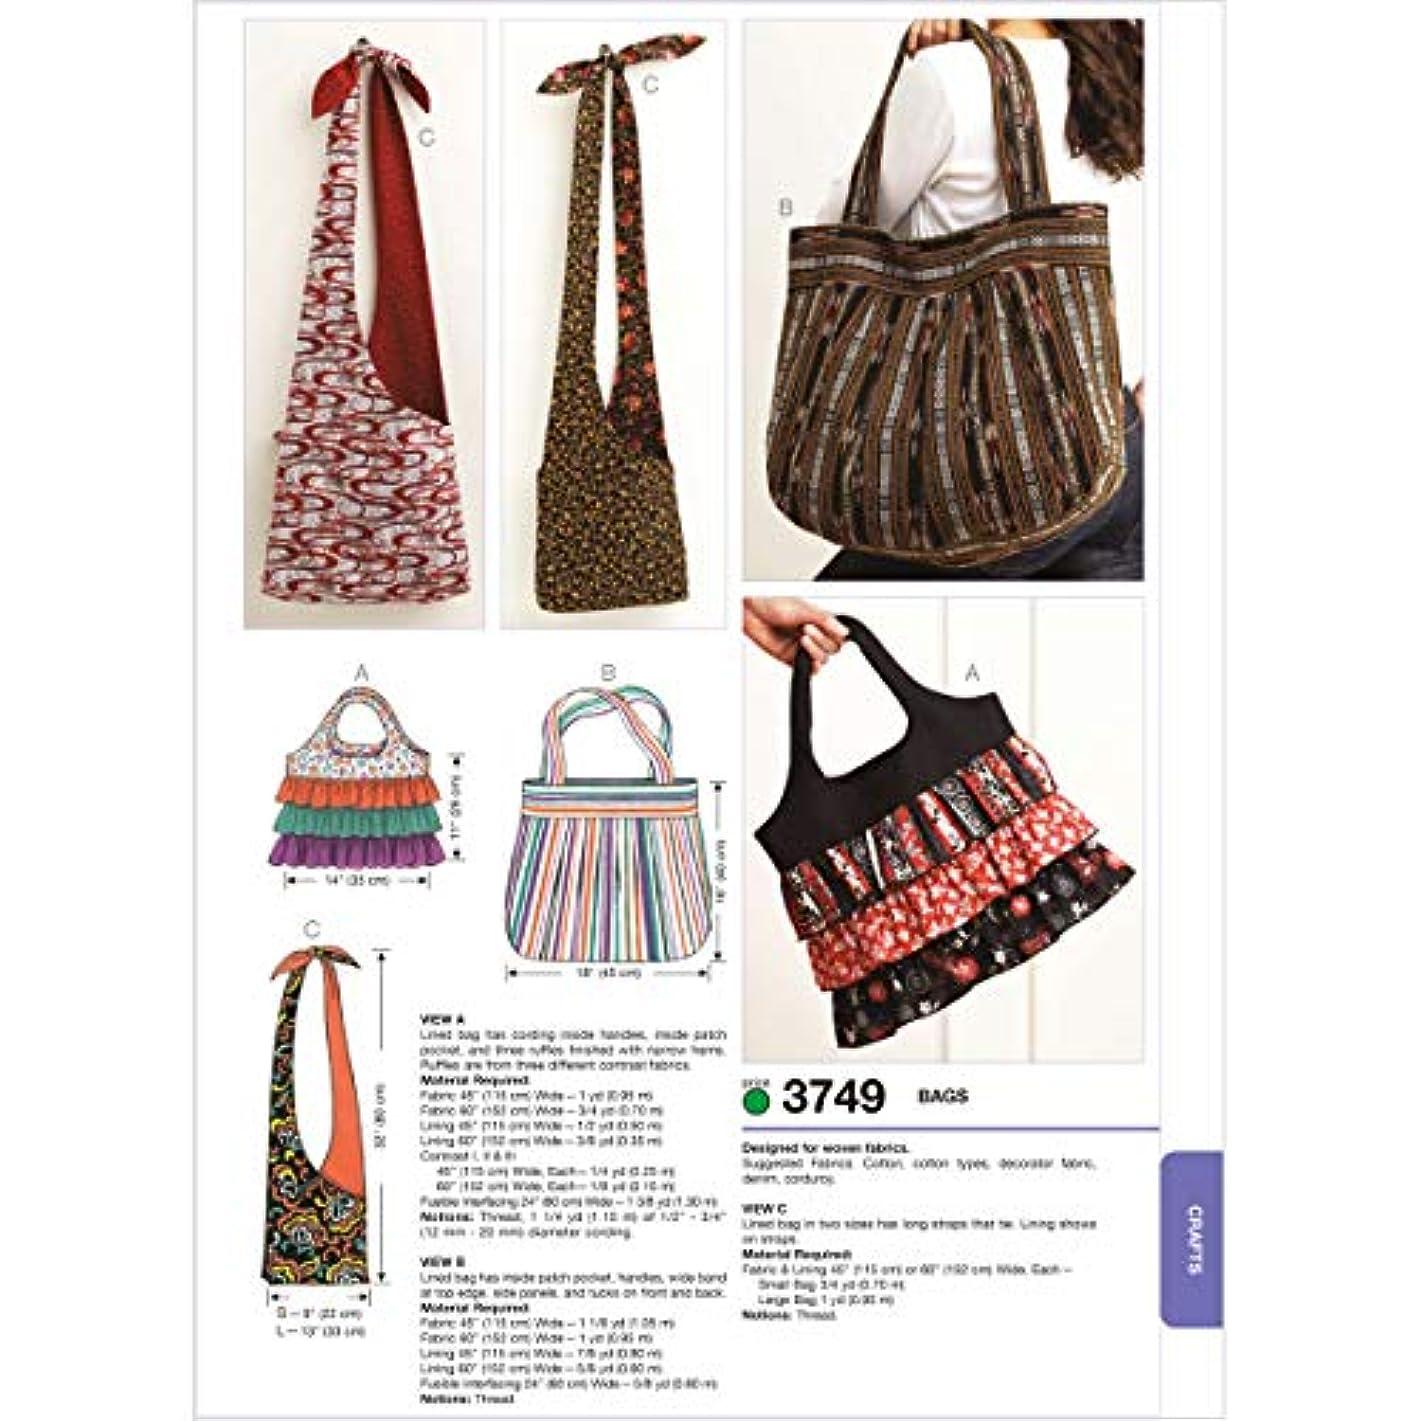 Kwik Sew K3749 Bags Sewing Pattern, No Size